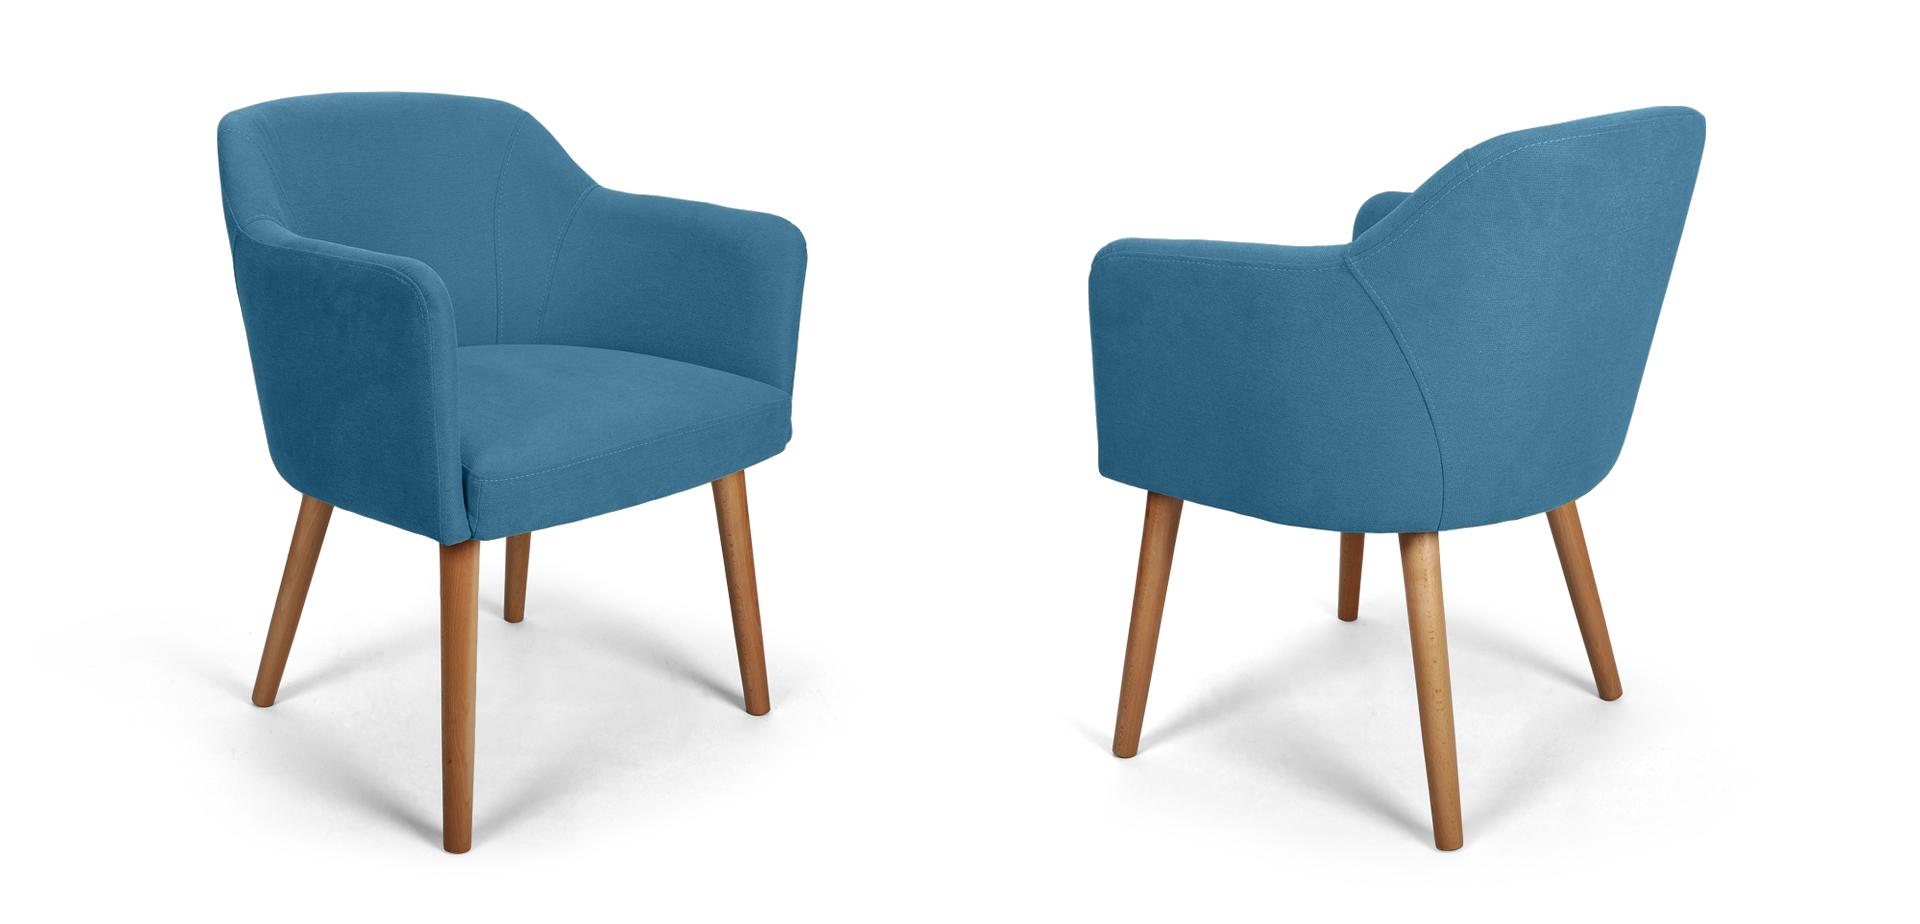 sofia-scaun-03.jpg